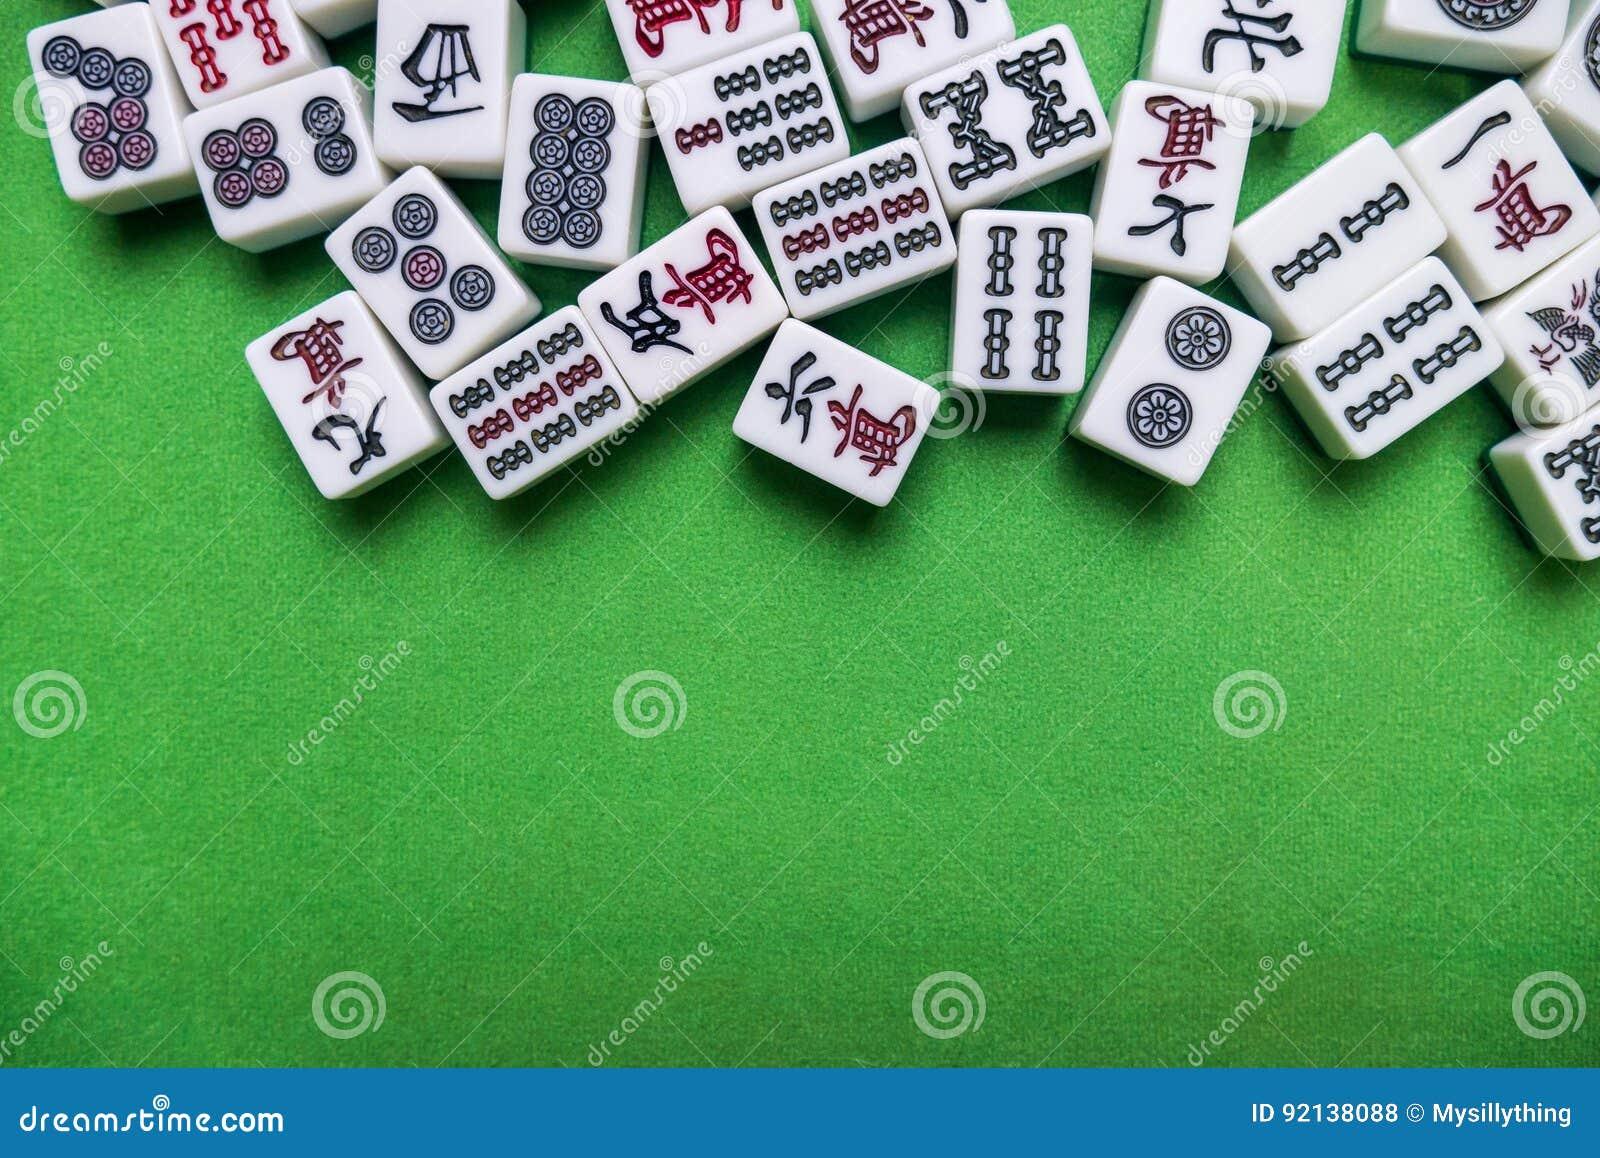 Онлайн казино бонус при регистрации без депозита